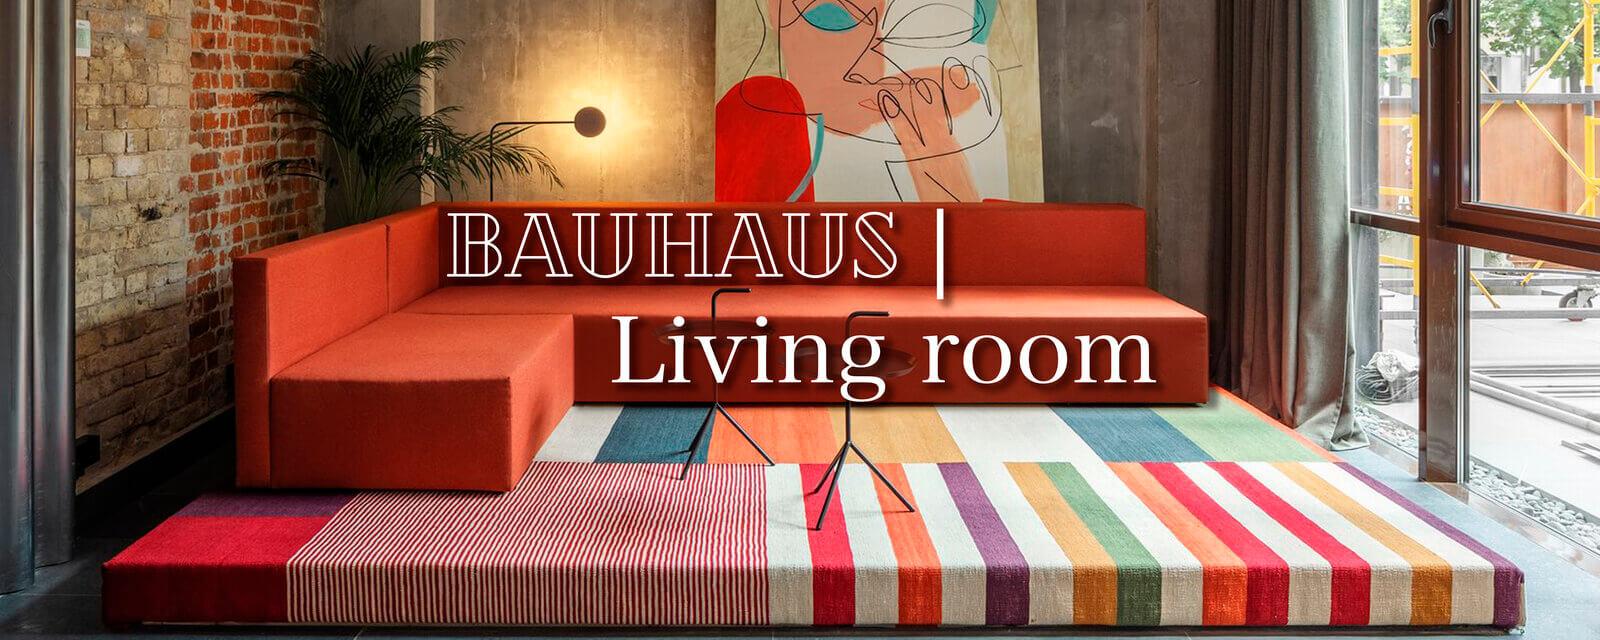 Bauhaus | Living Room